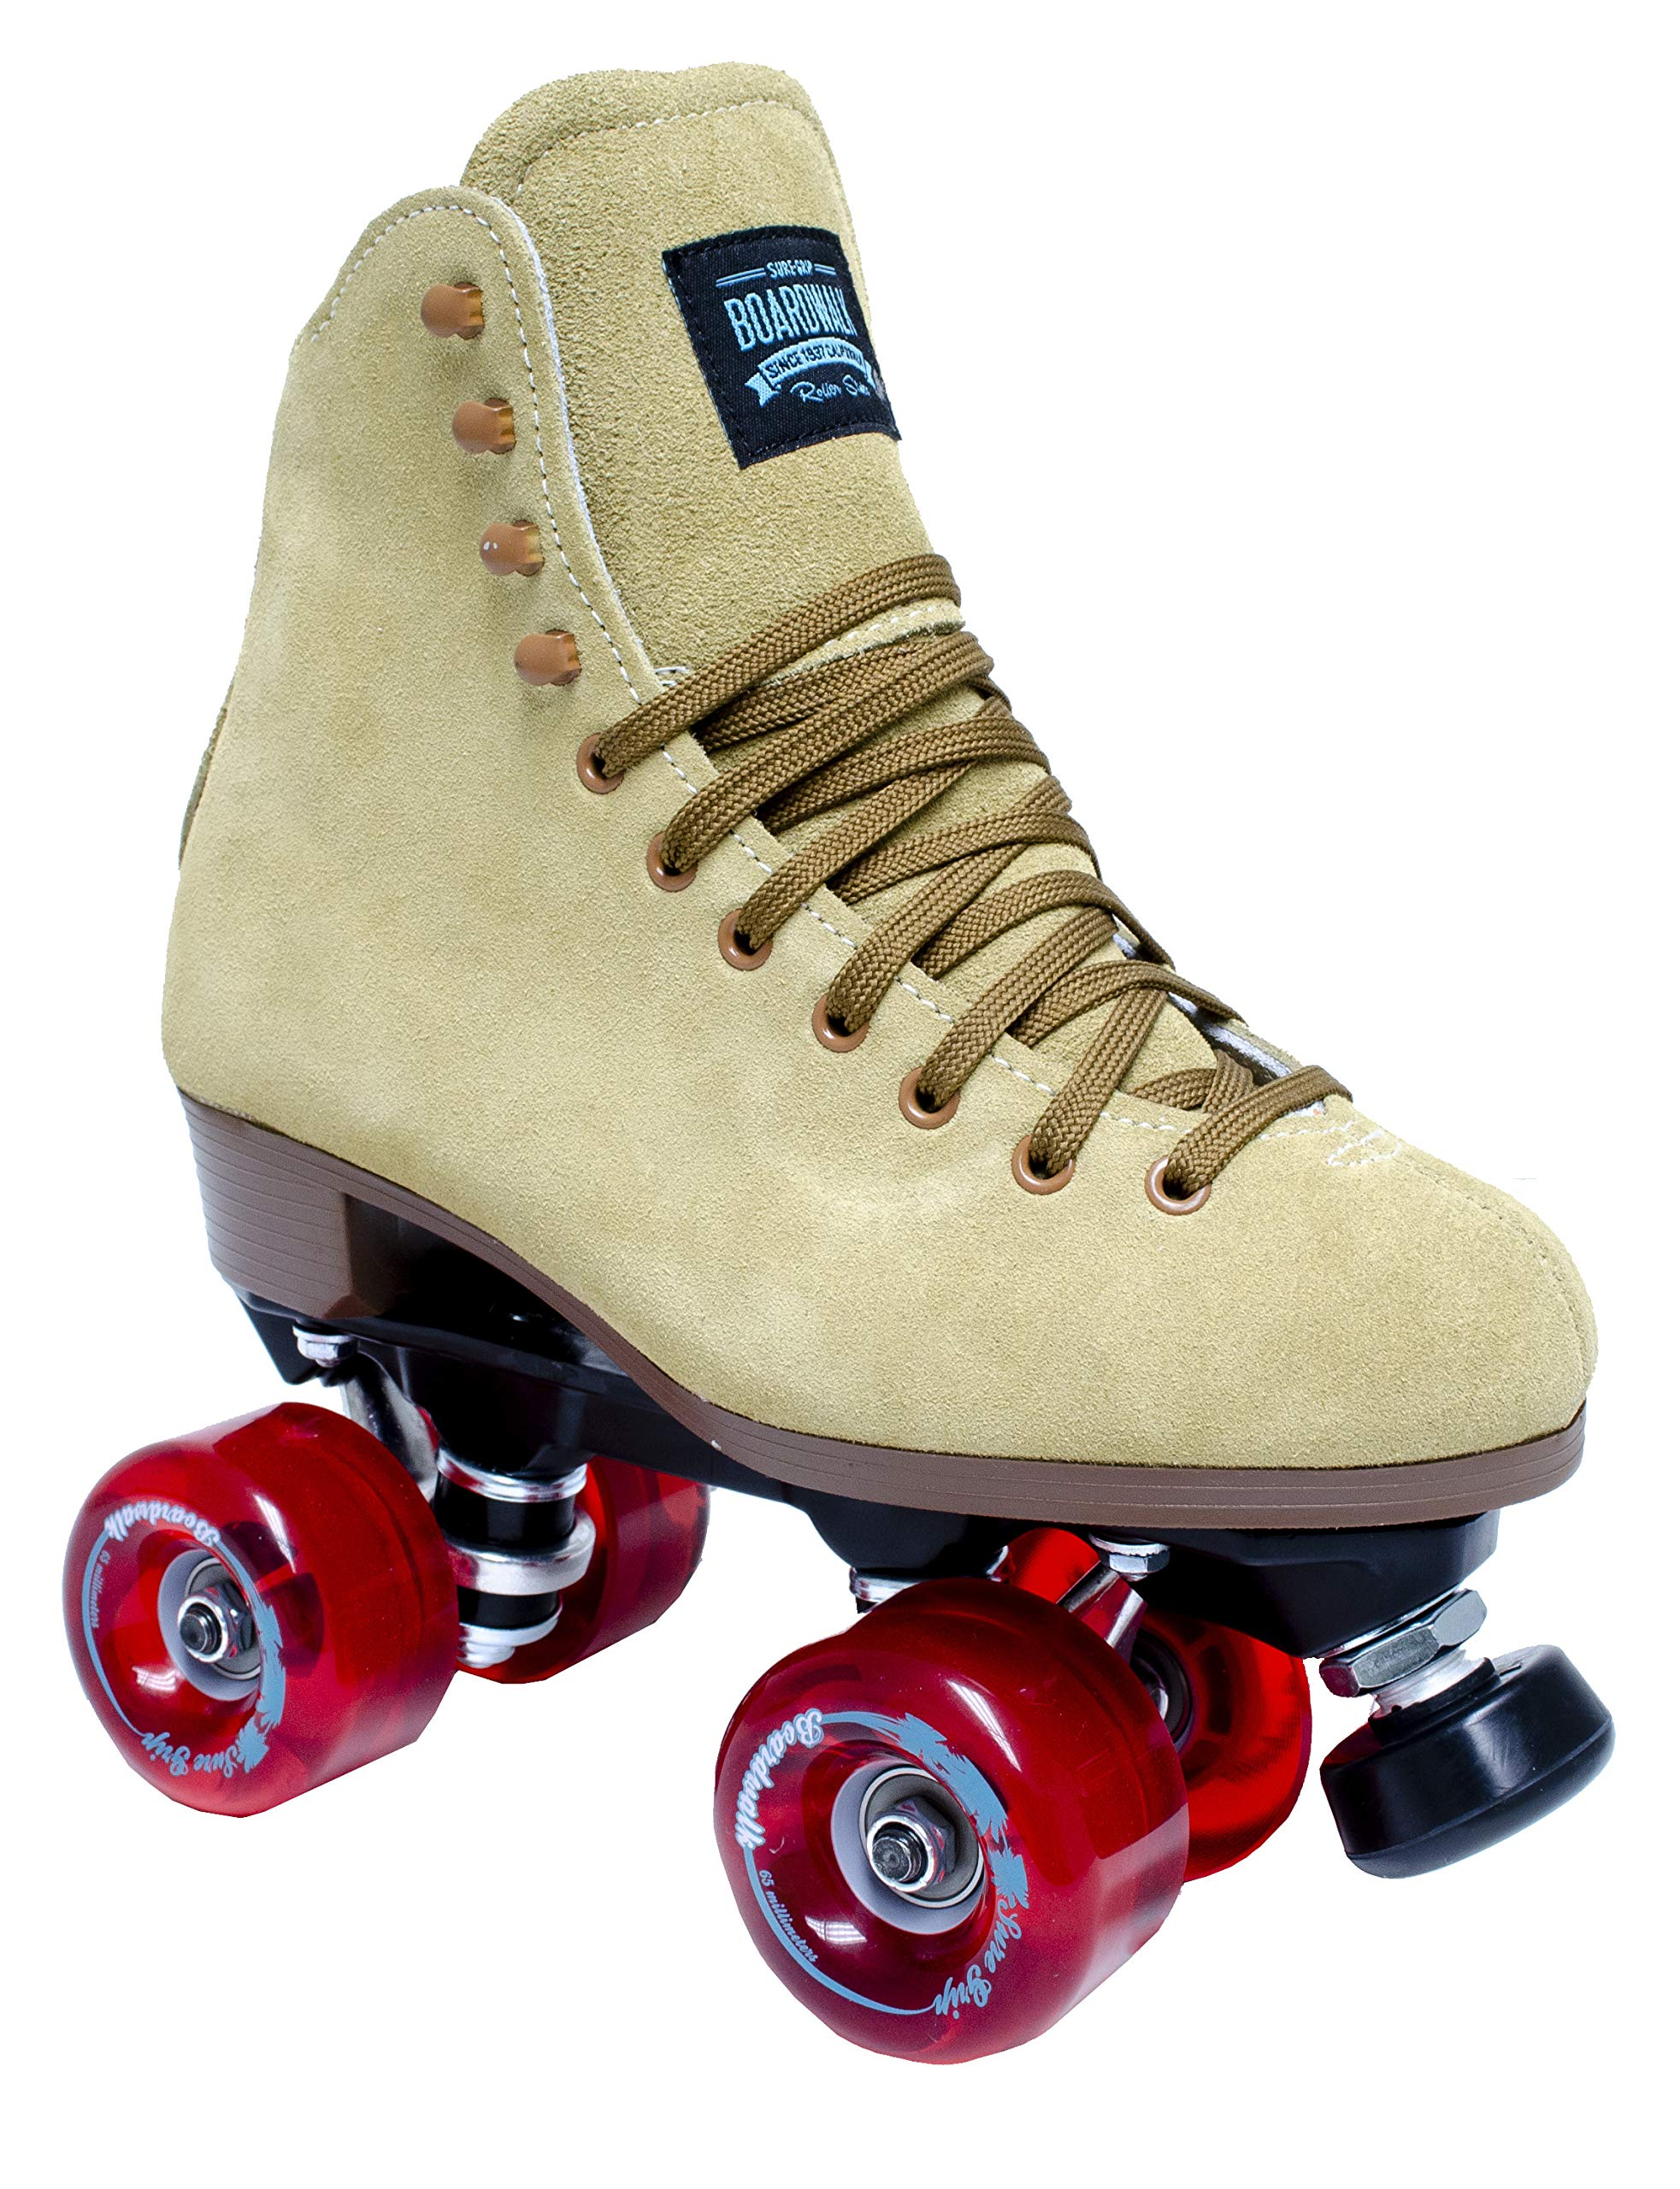 Sure-Grip Tan Boardwalk Skates (13)